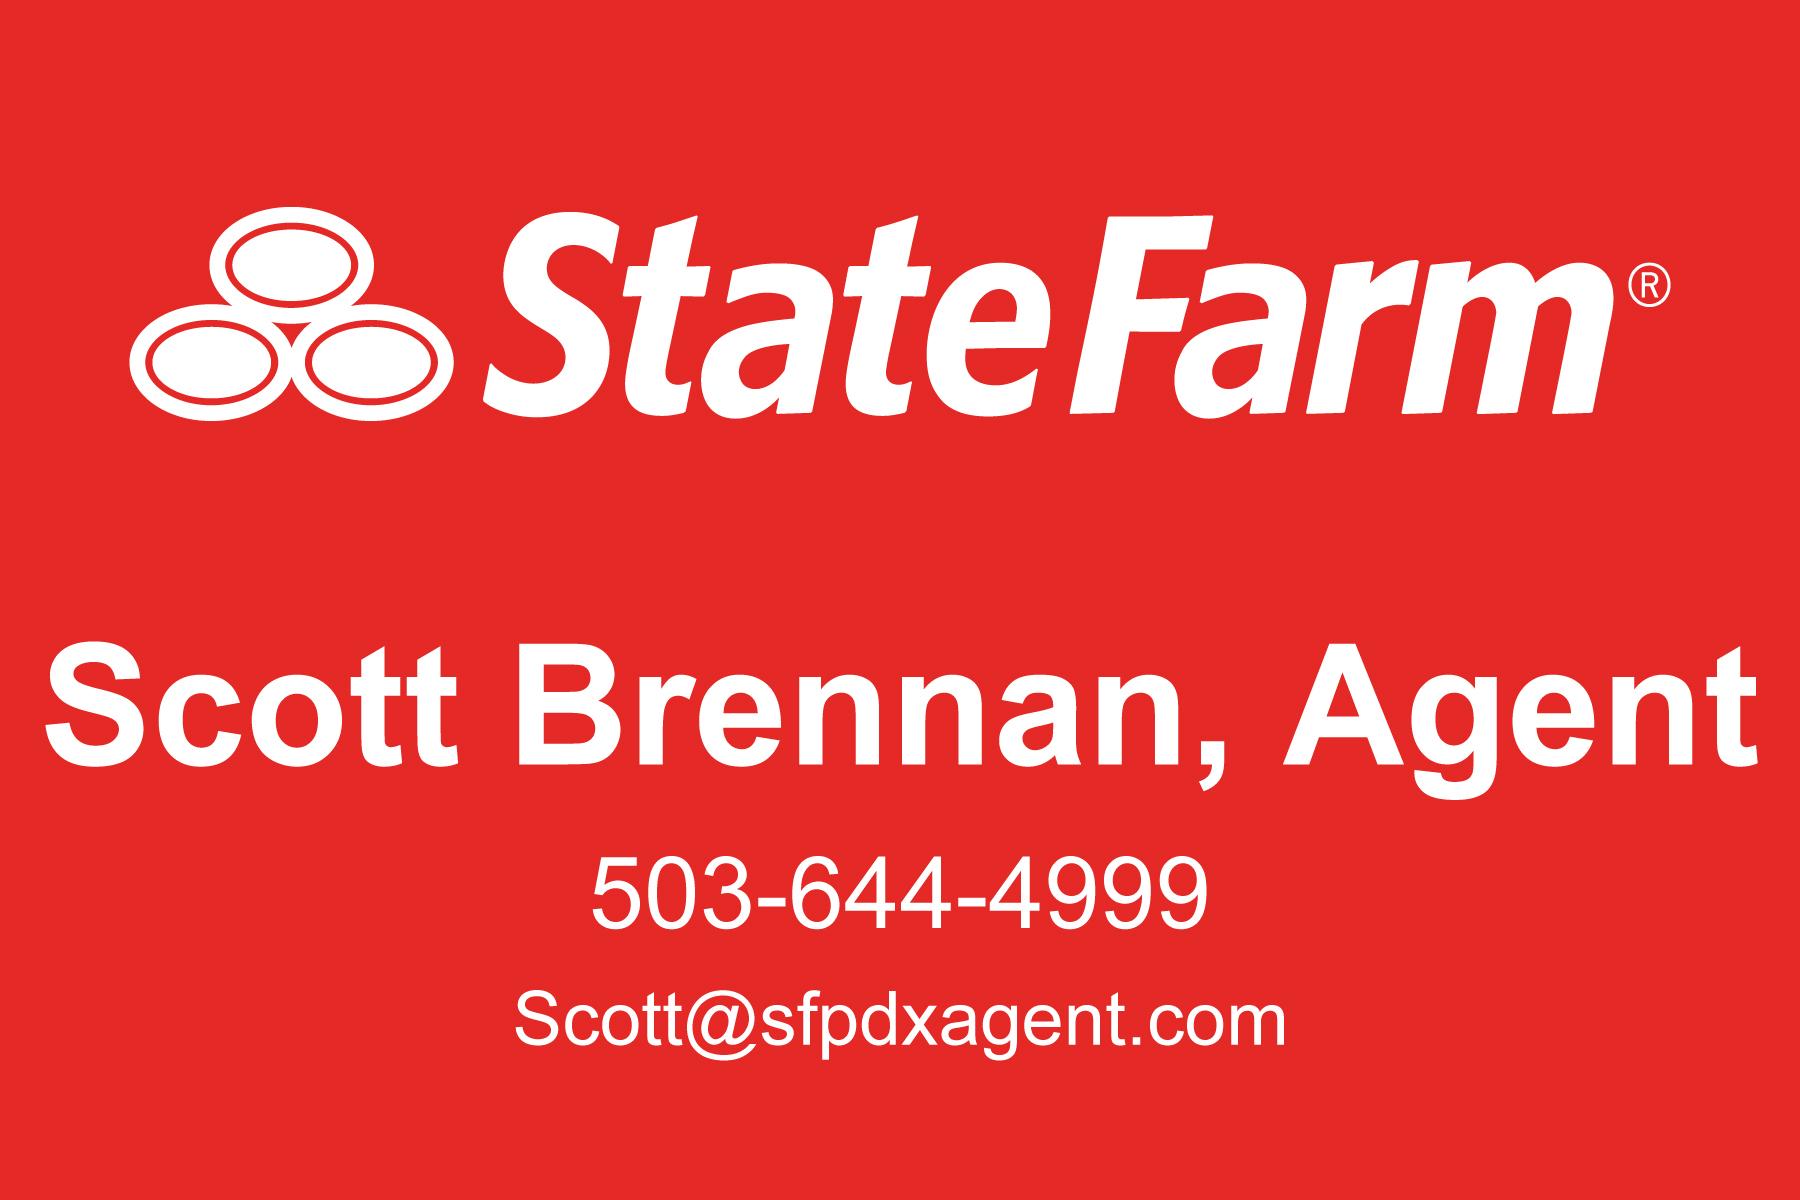 State Farm Logo_Scott Brennan.jpg